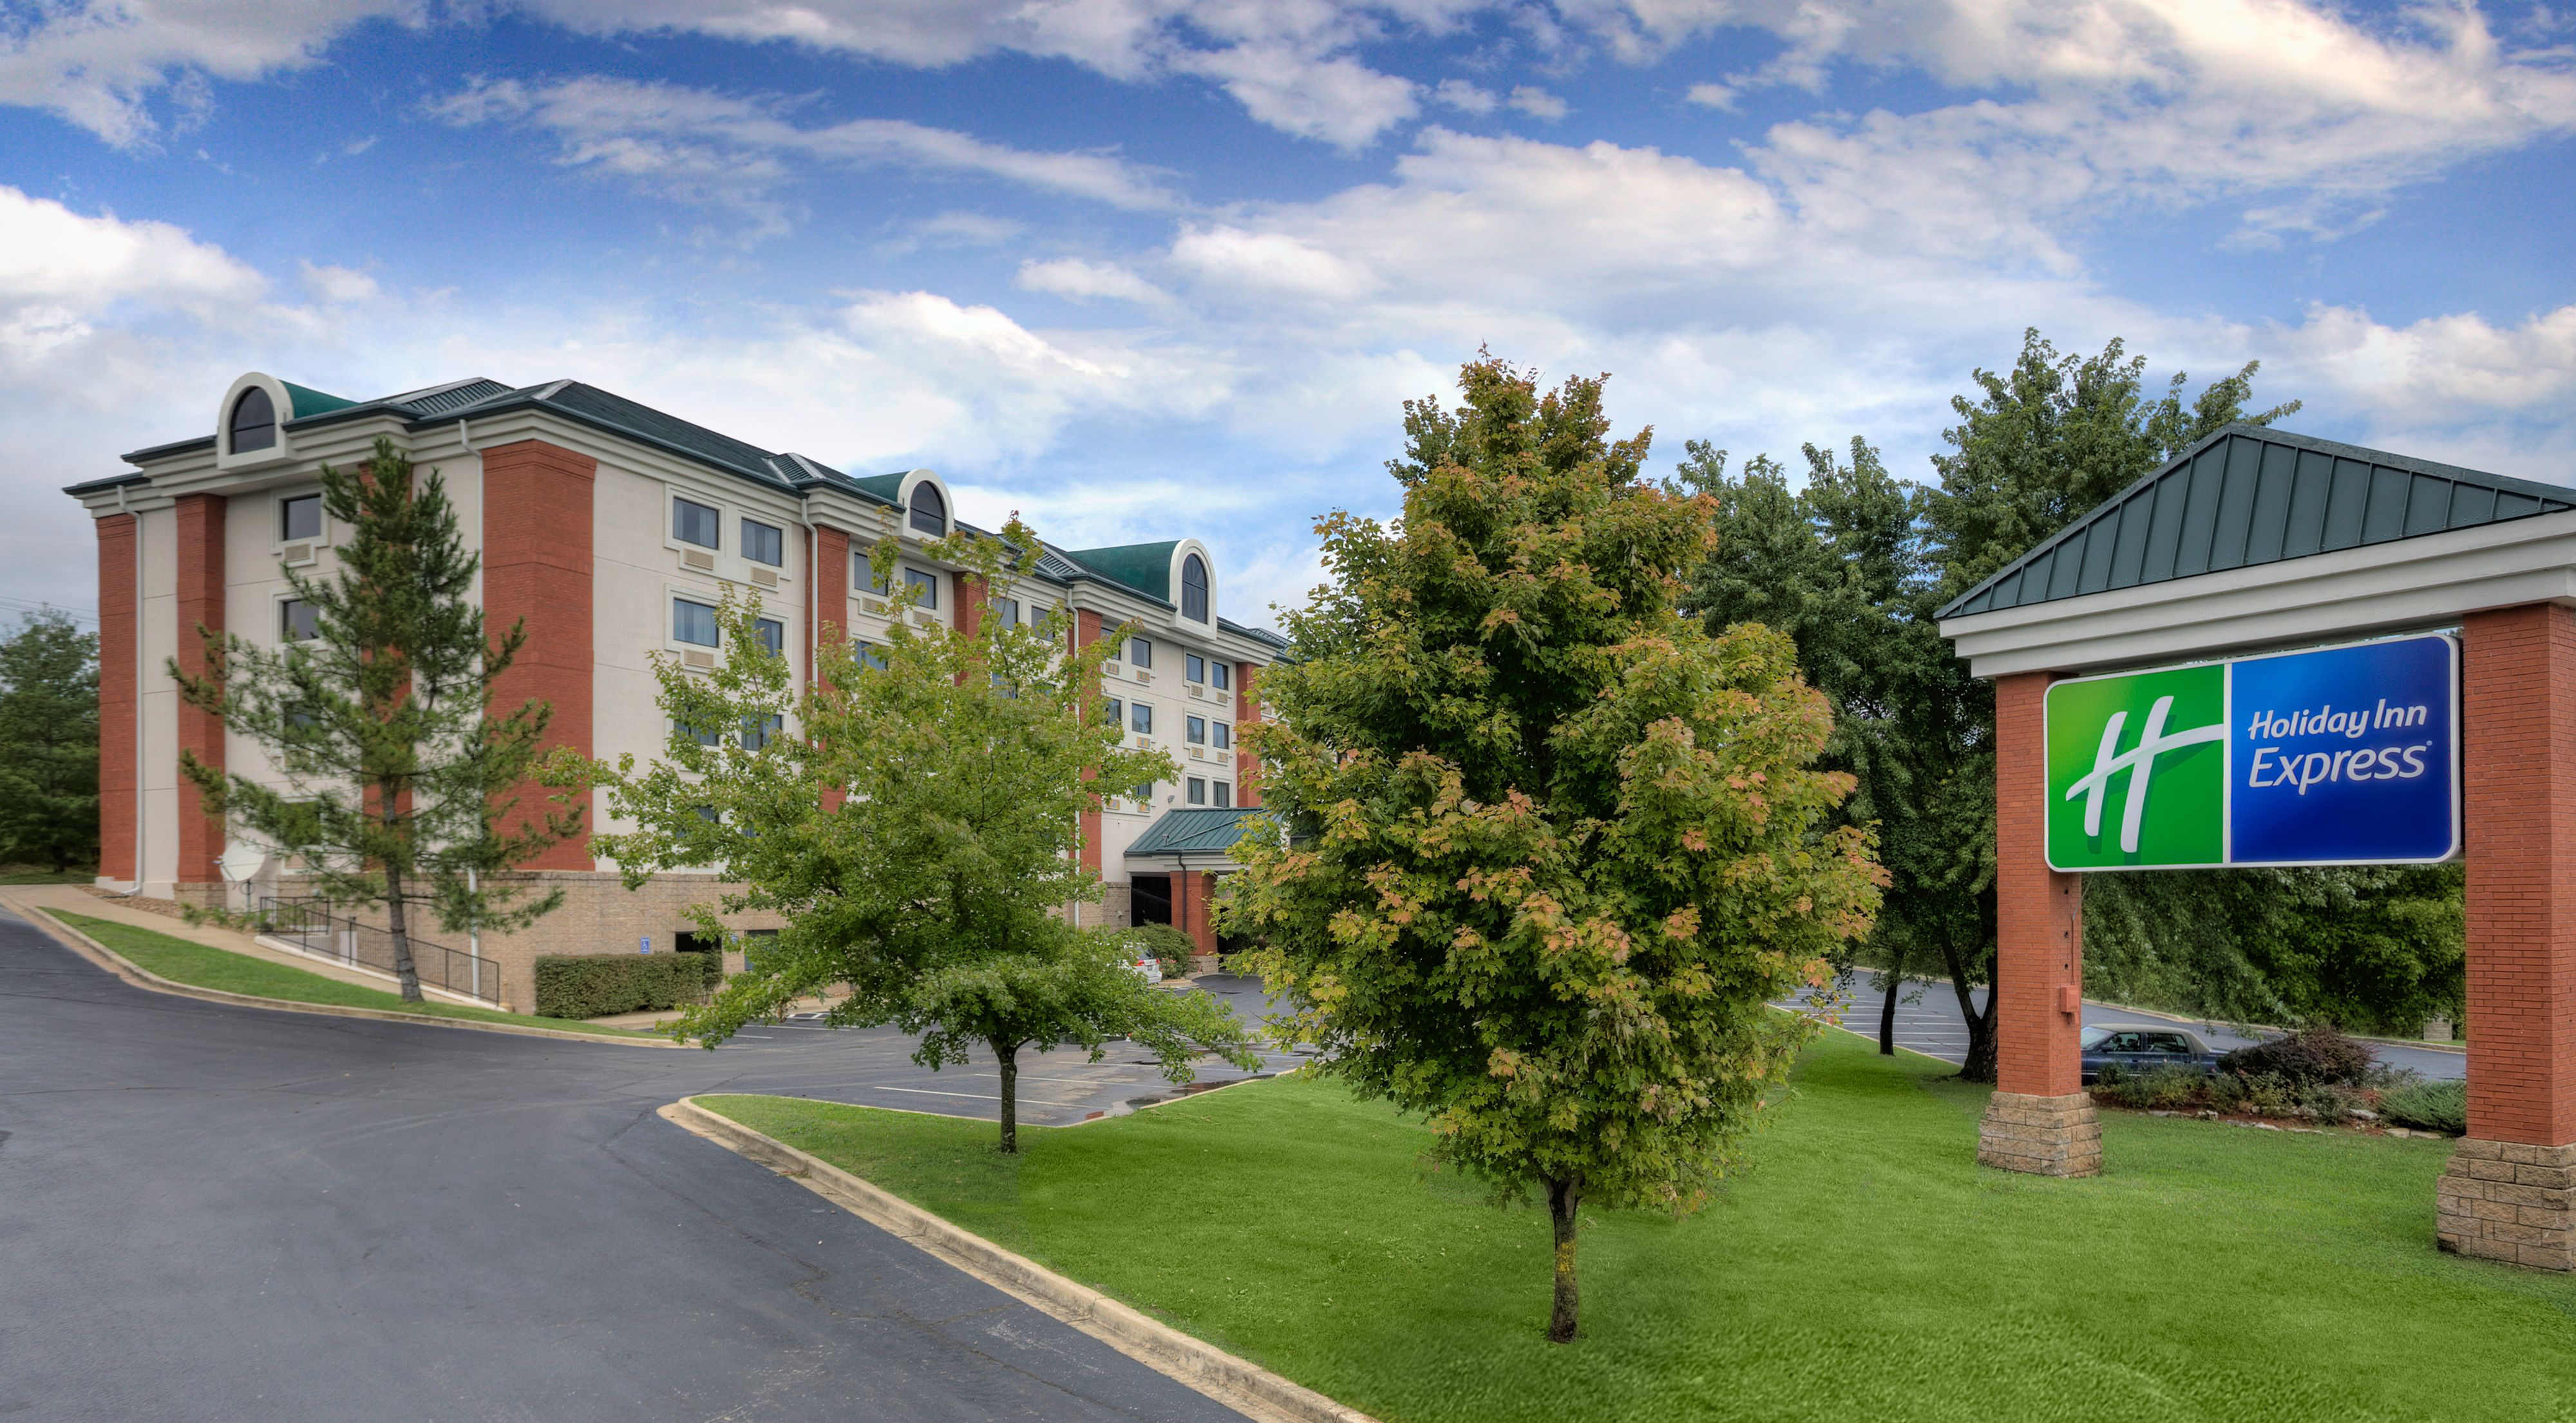 Holiday Inn Express Branford New Haven In Branford Ct